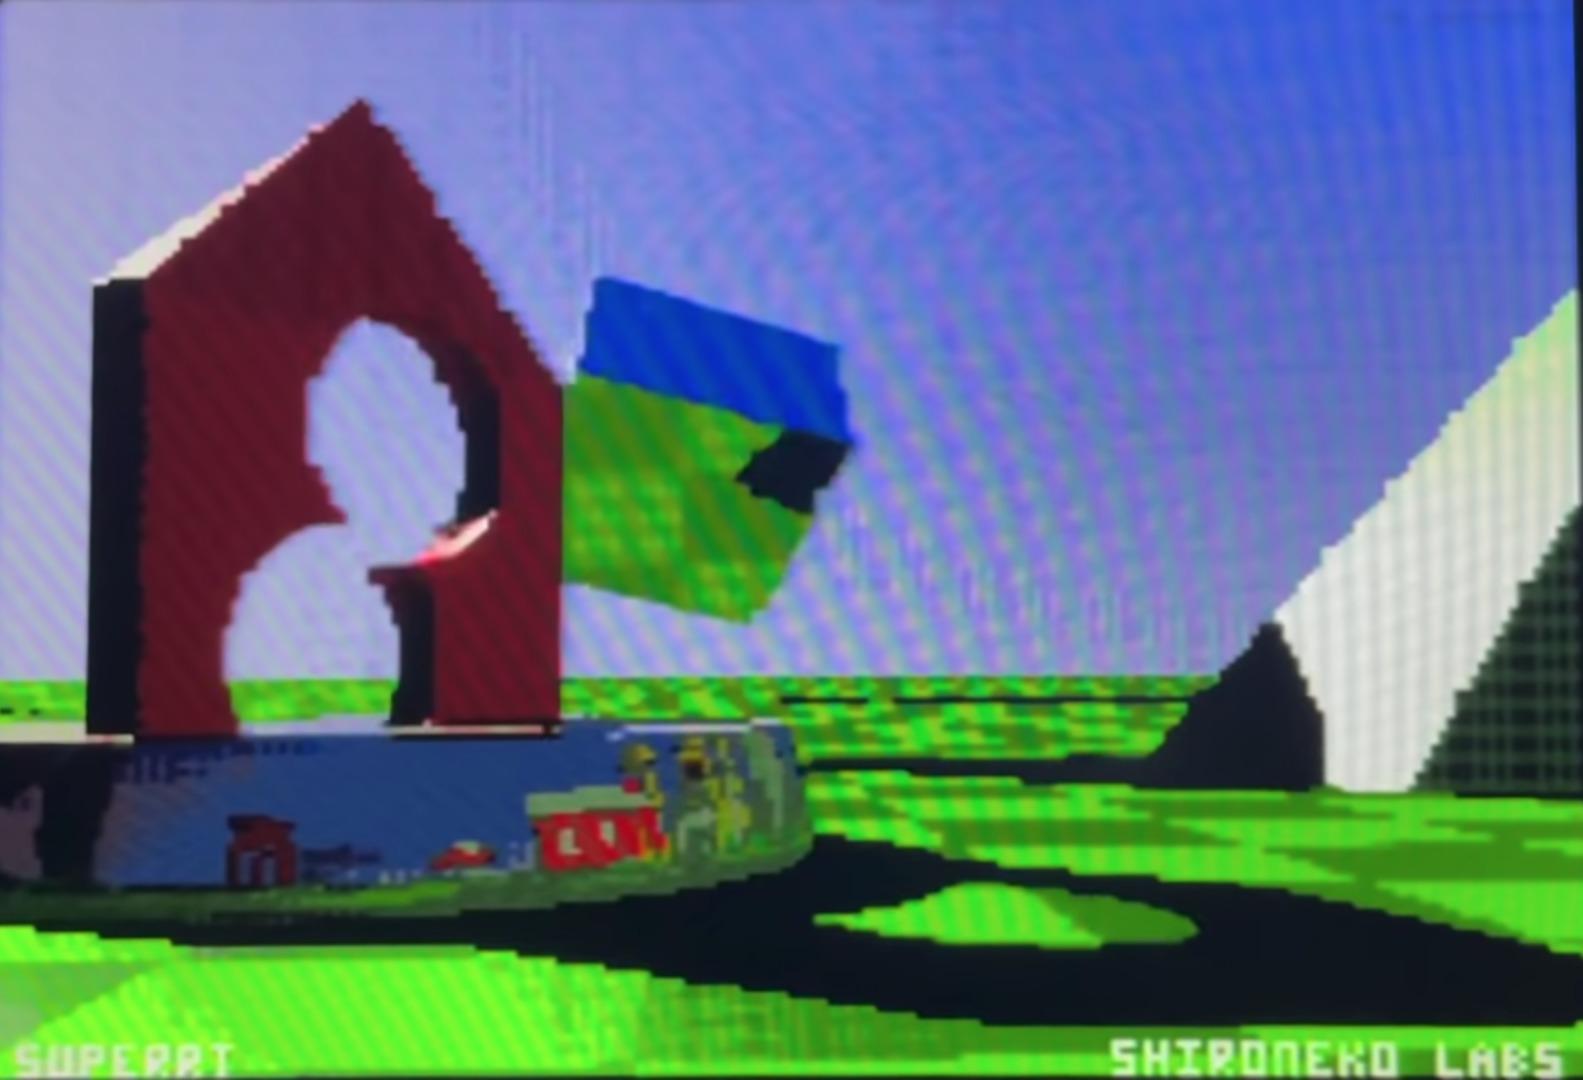 Super Nintendo ray tracing